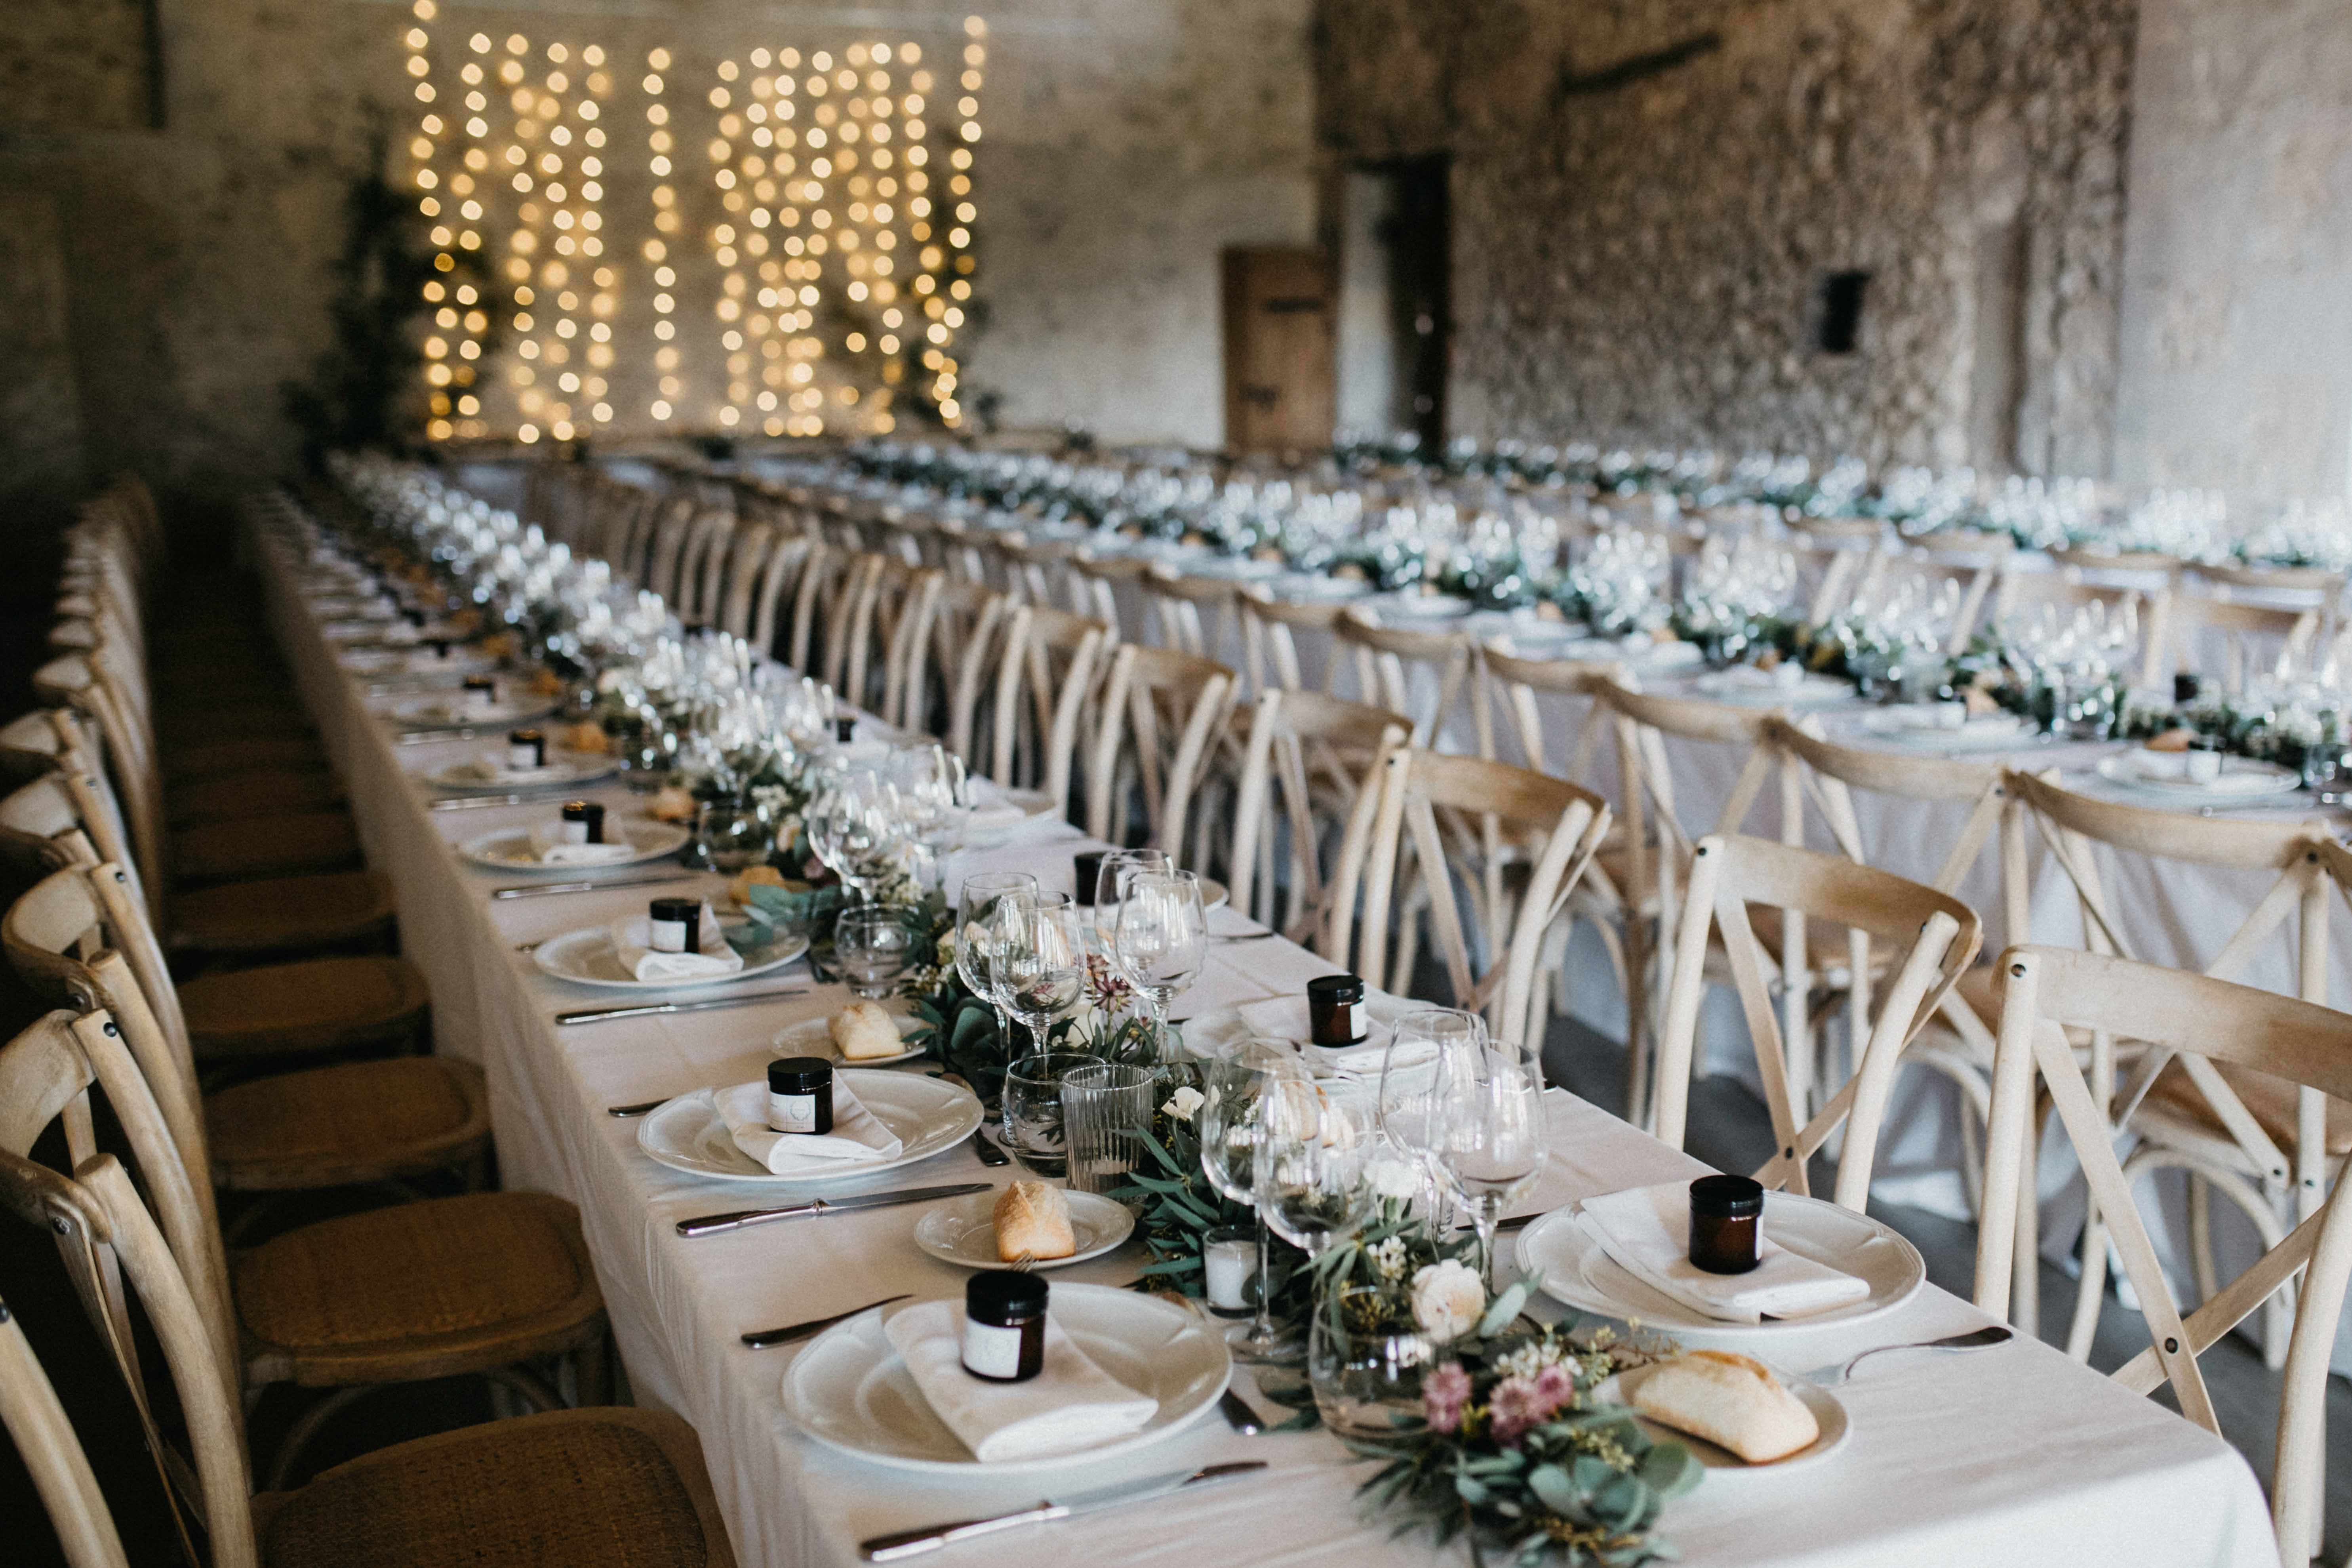 candid wedding photography guide - photojaanic -5